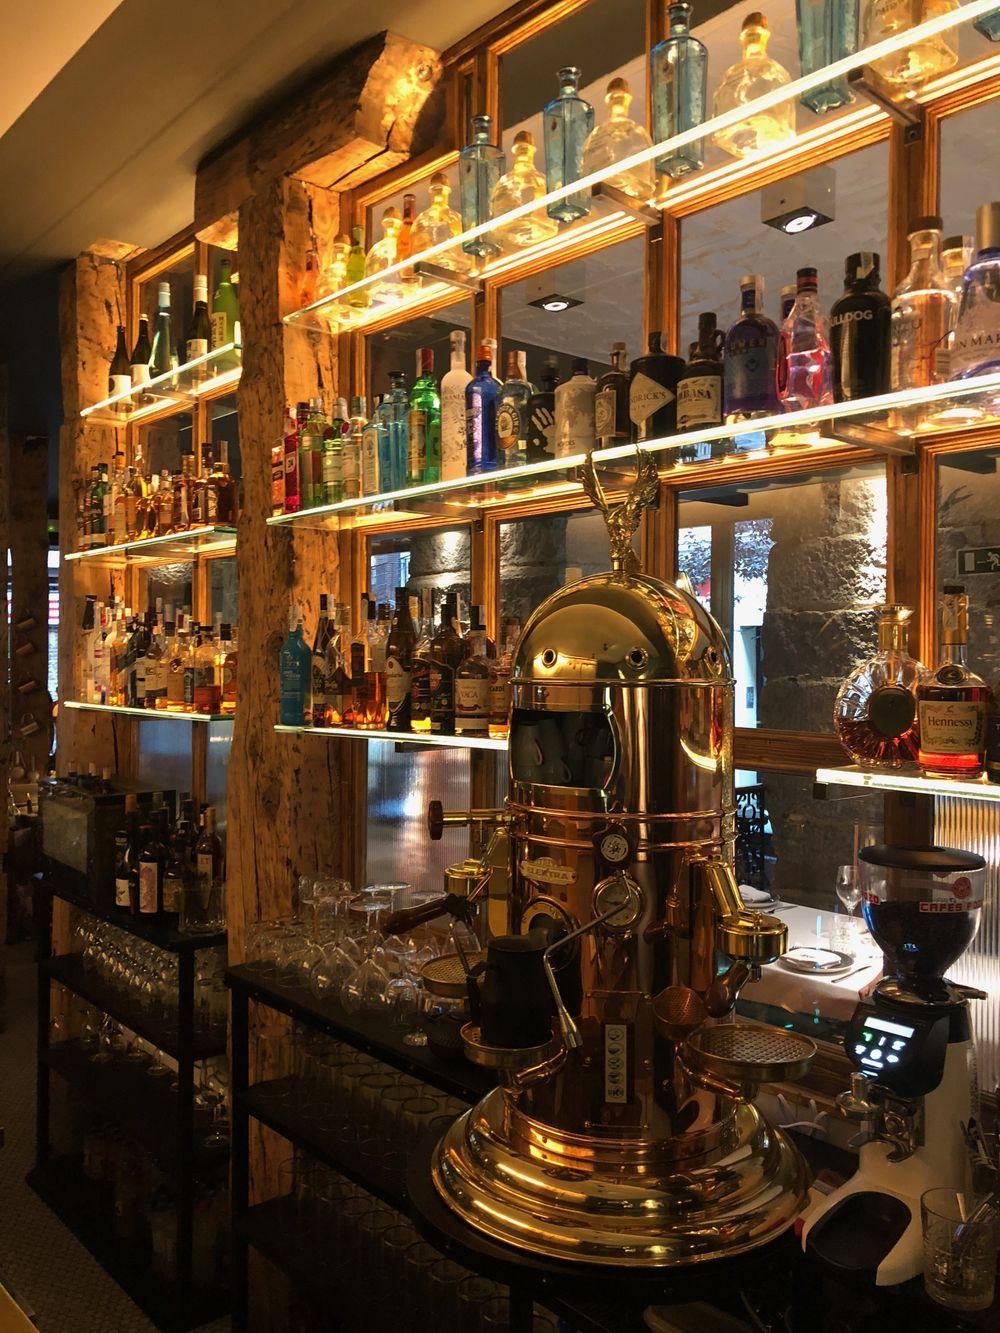 decadente-restaurant-madrid-spain-nogarlicnoonions-1502018-09-19-11-24-52